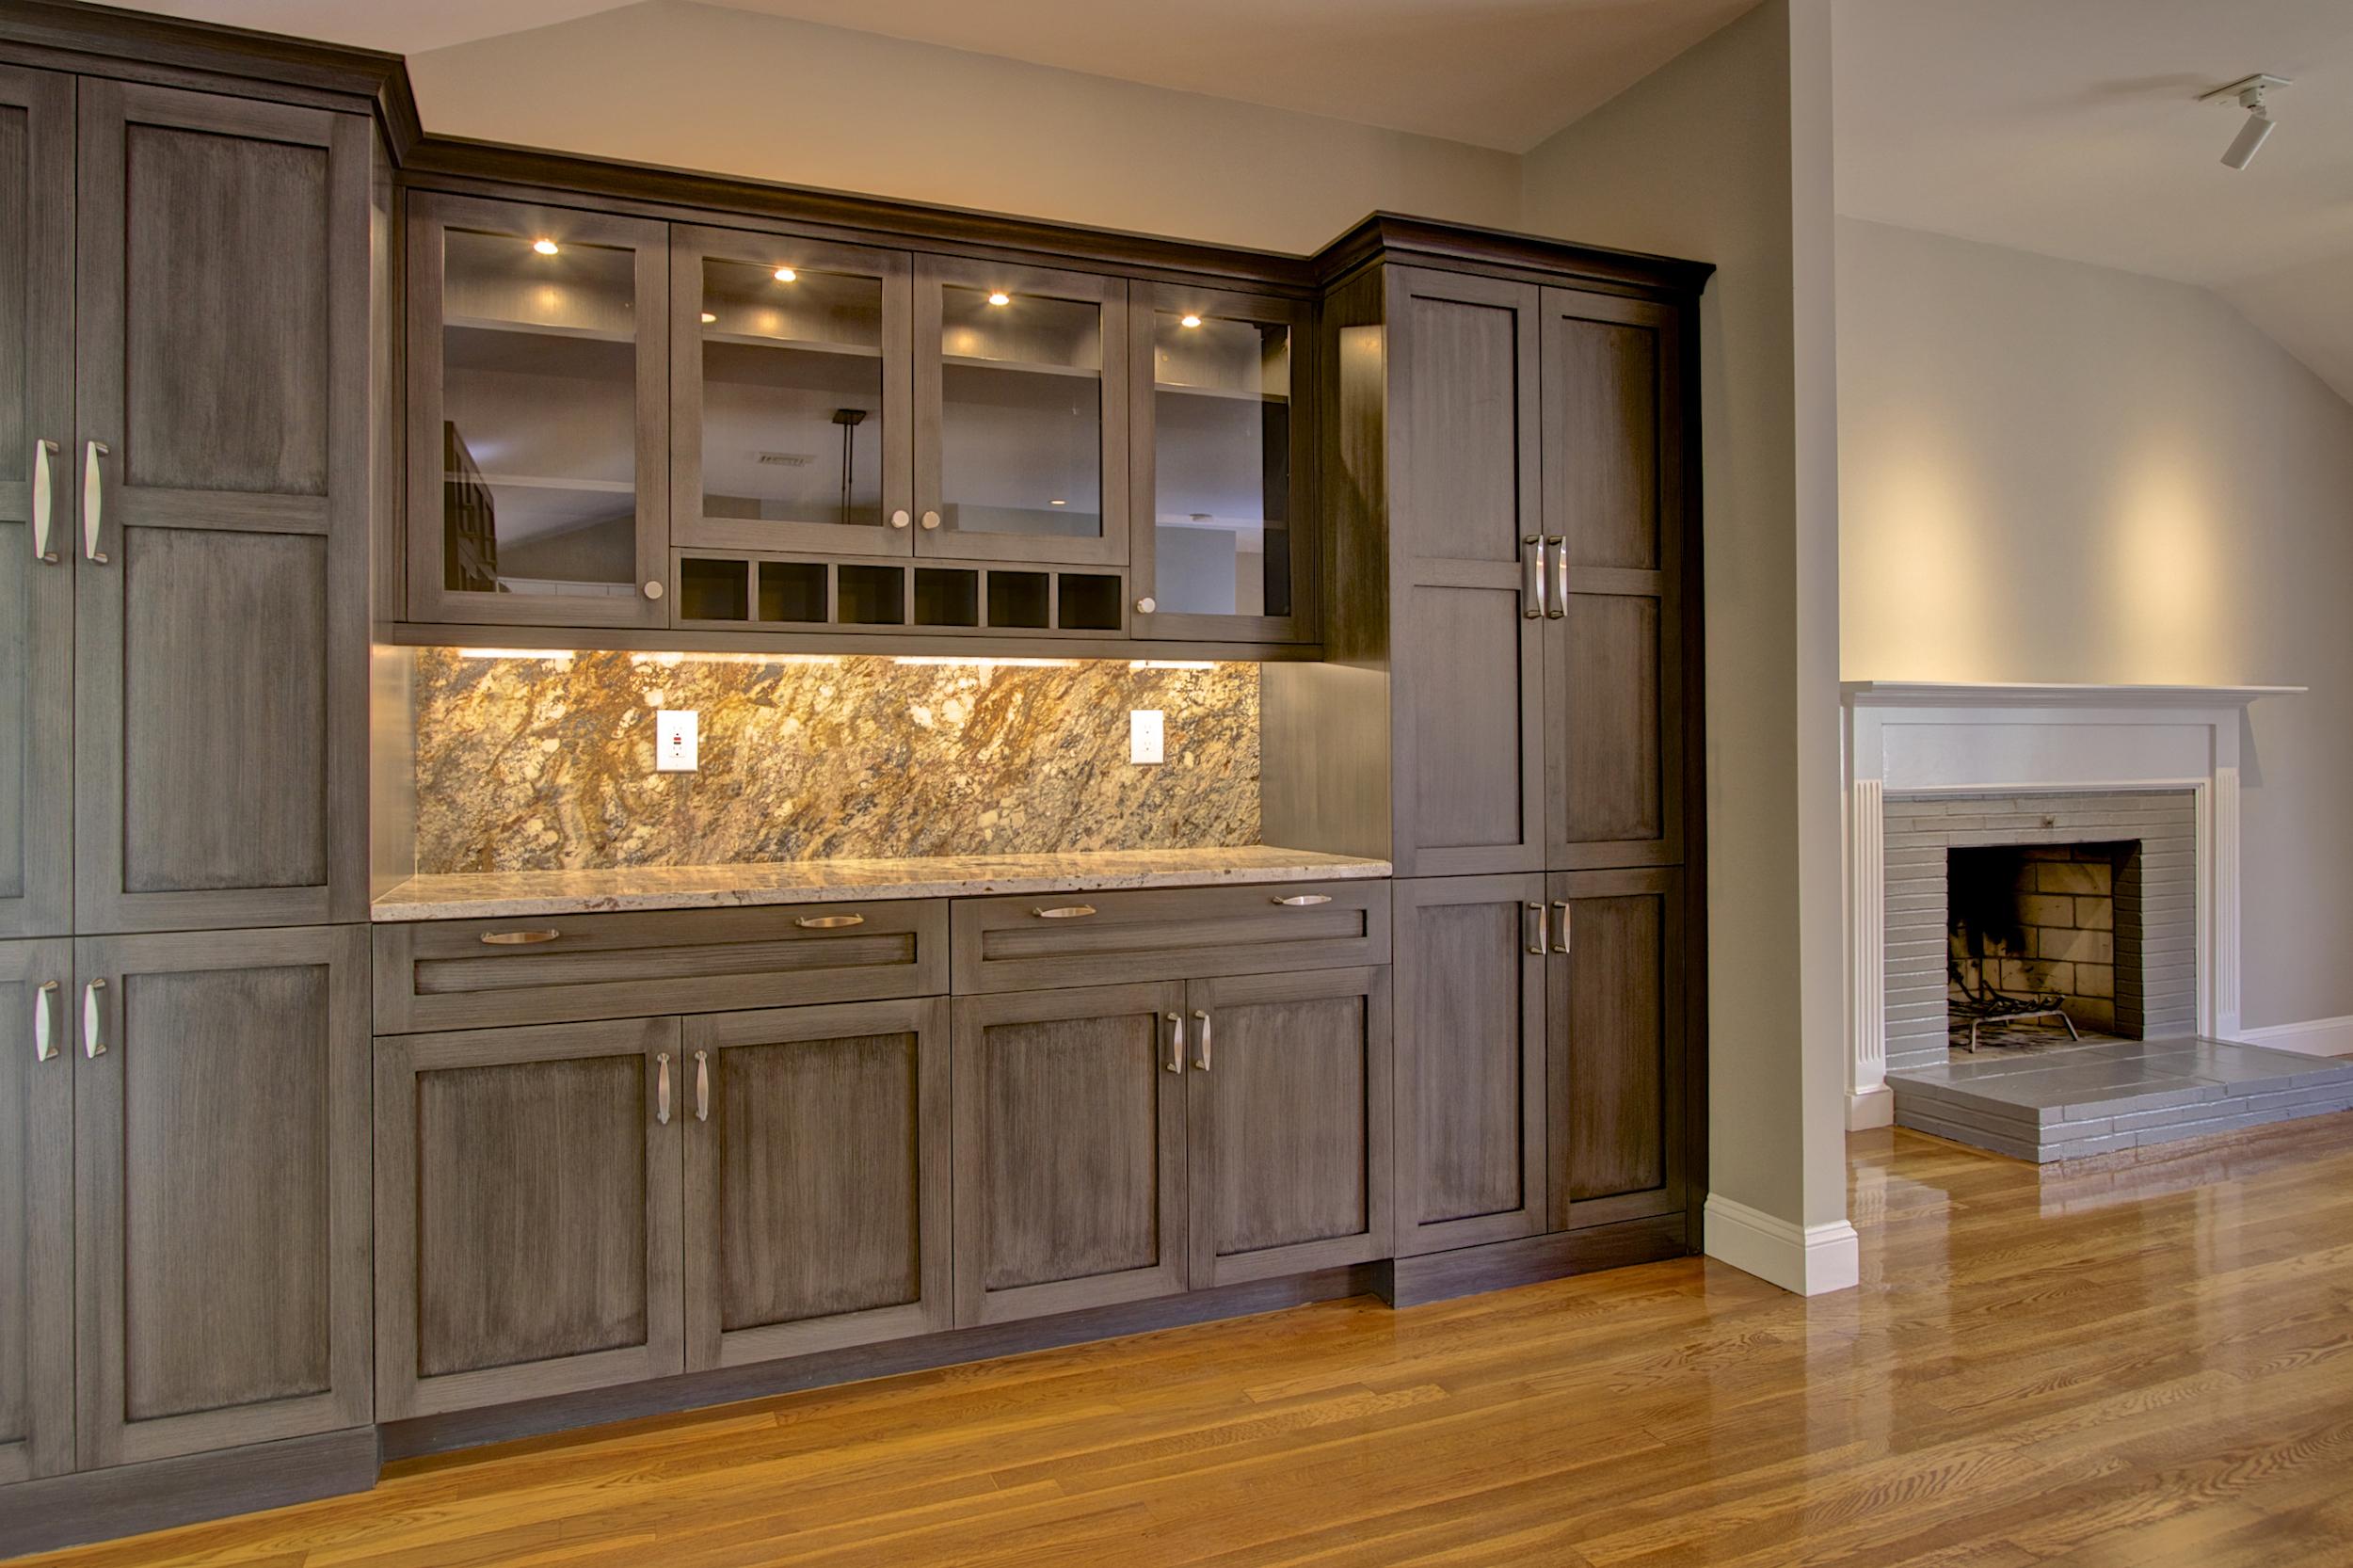 2-KitchenVisions-Bar-Pantry-Needham.jpg